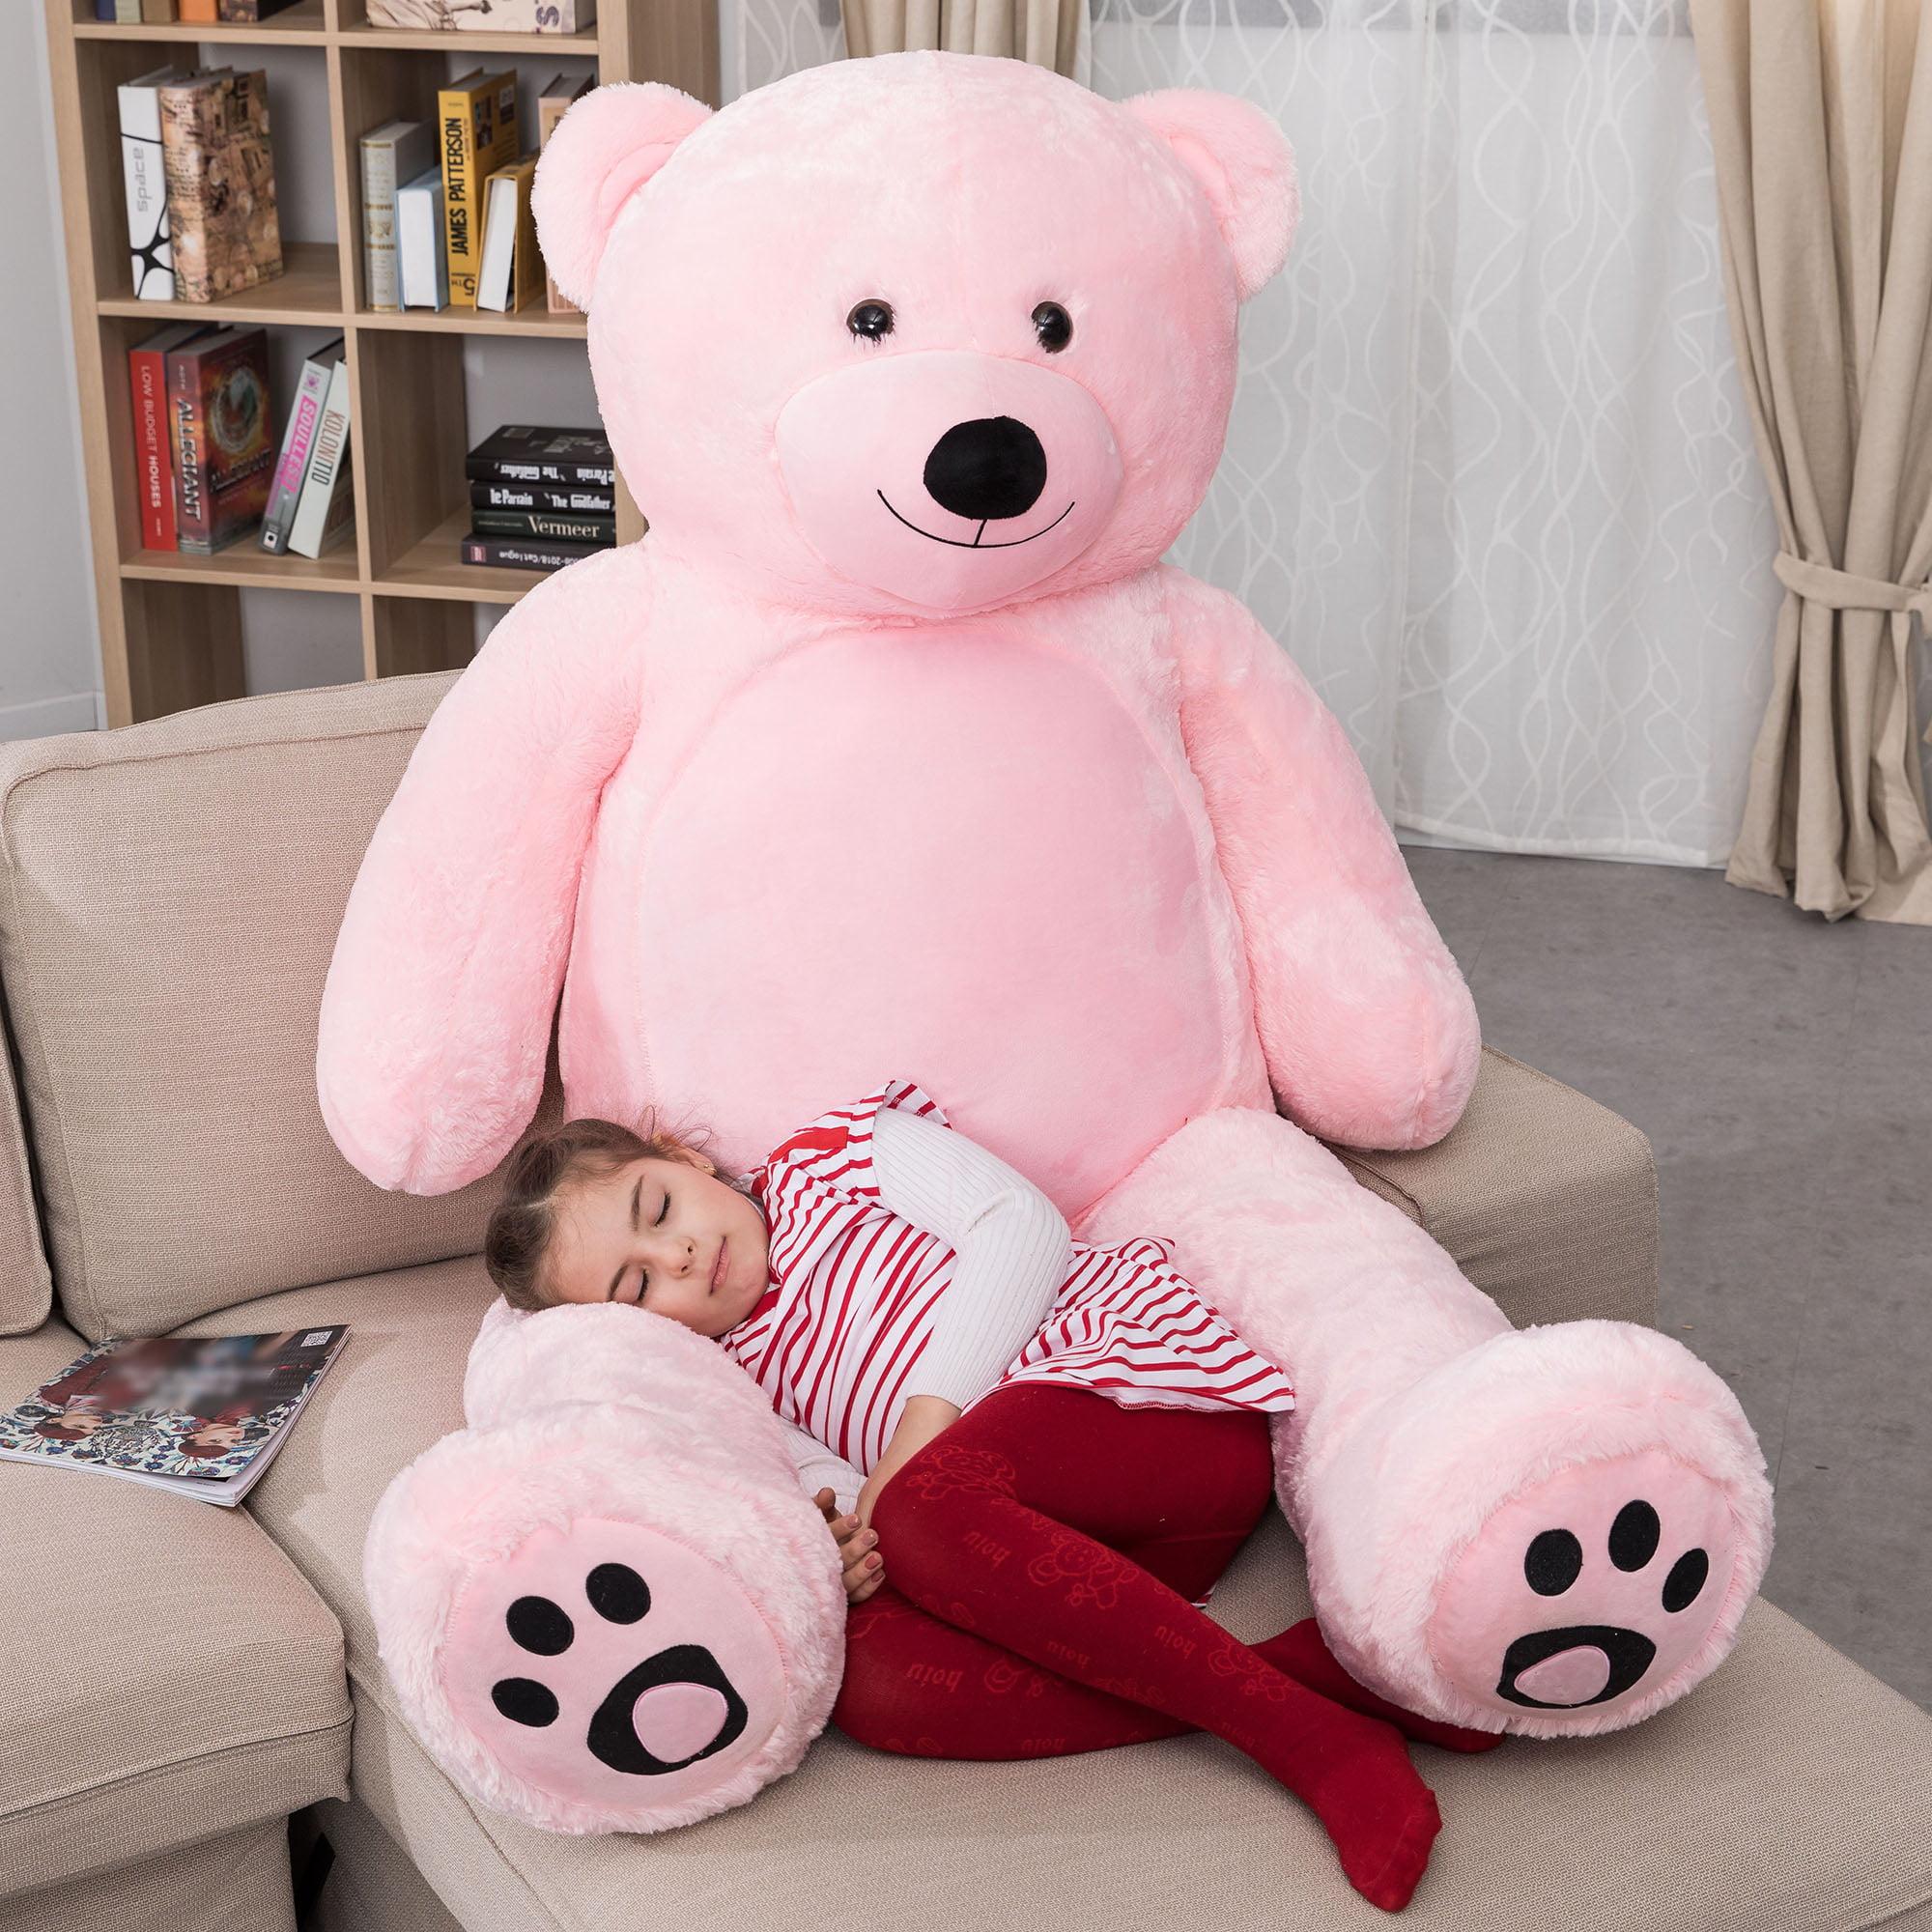 WOWMAX 6 Foot Giant Huge Life Size Teddy Bear Daney Cuddly Stuffed Plush Animals Teddy Bear Toy Doll for... by